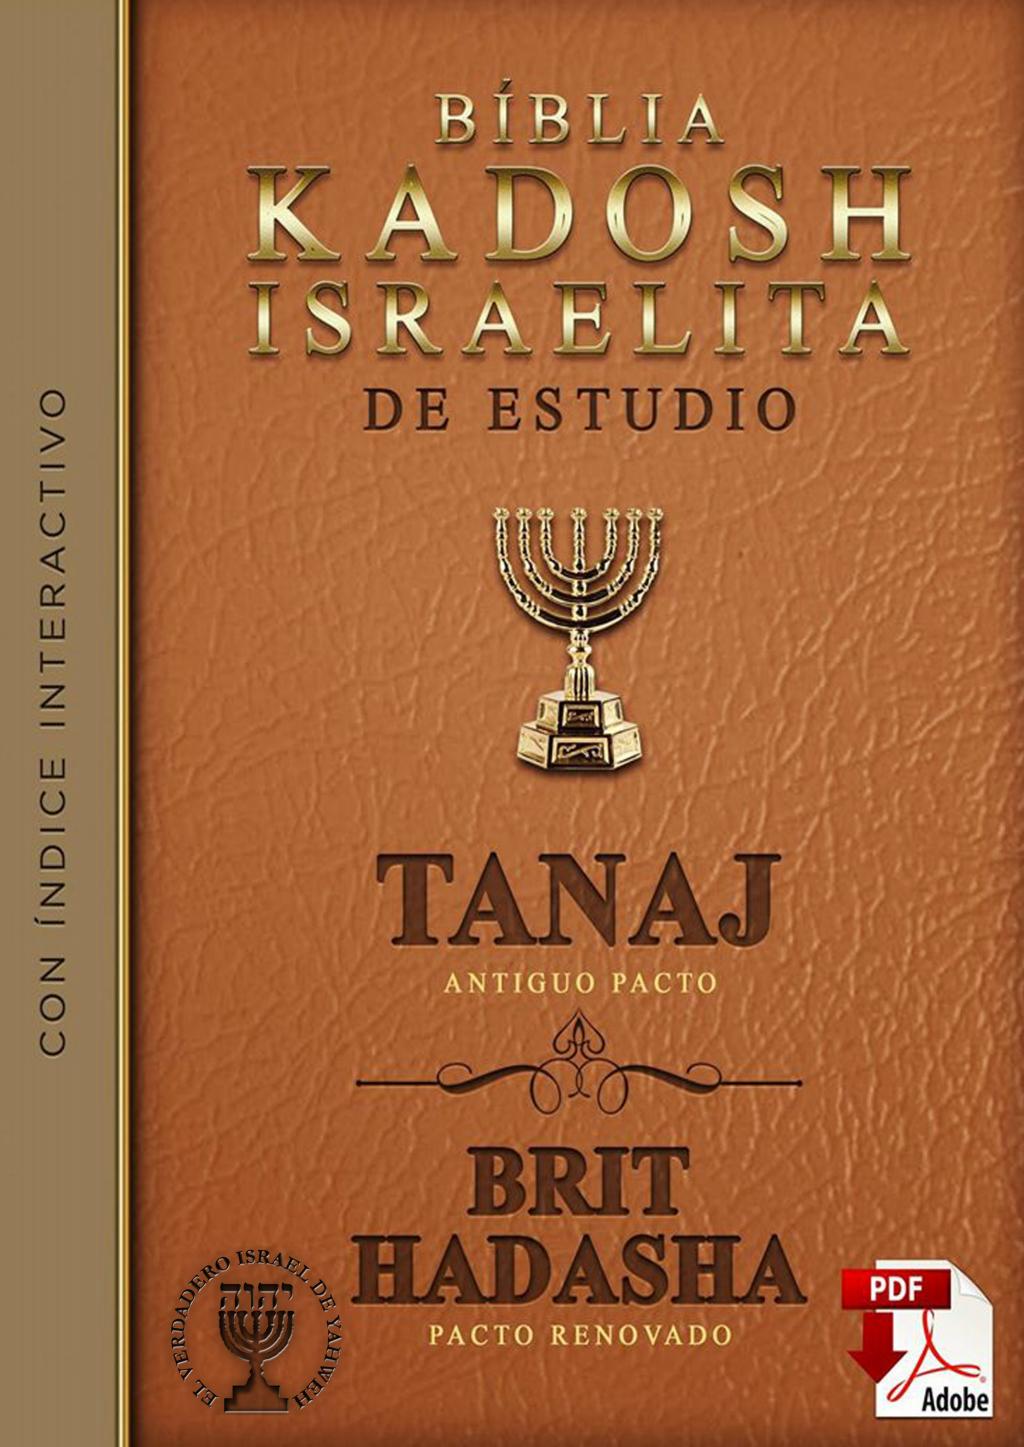 brit hadasha en español pdf